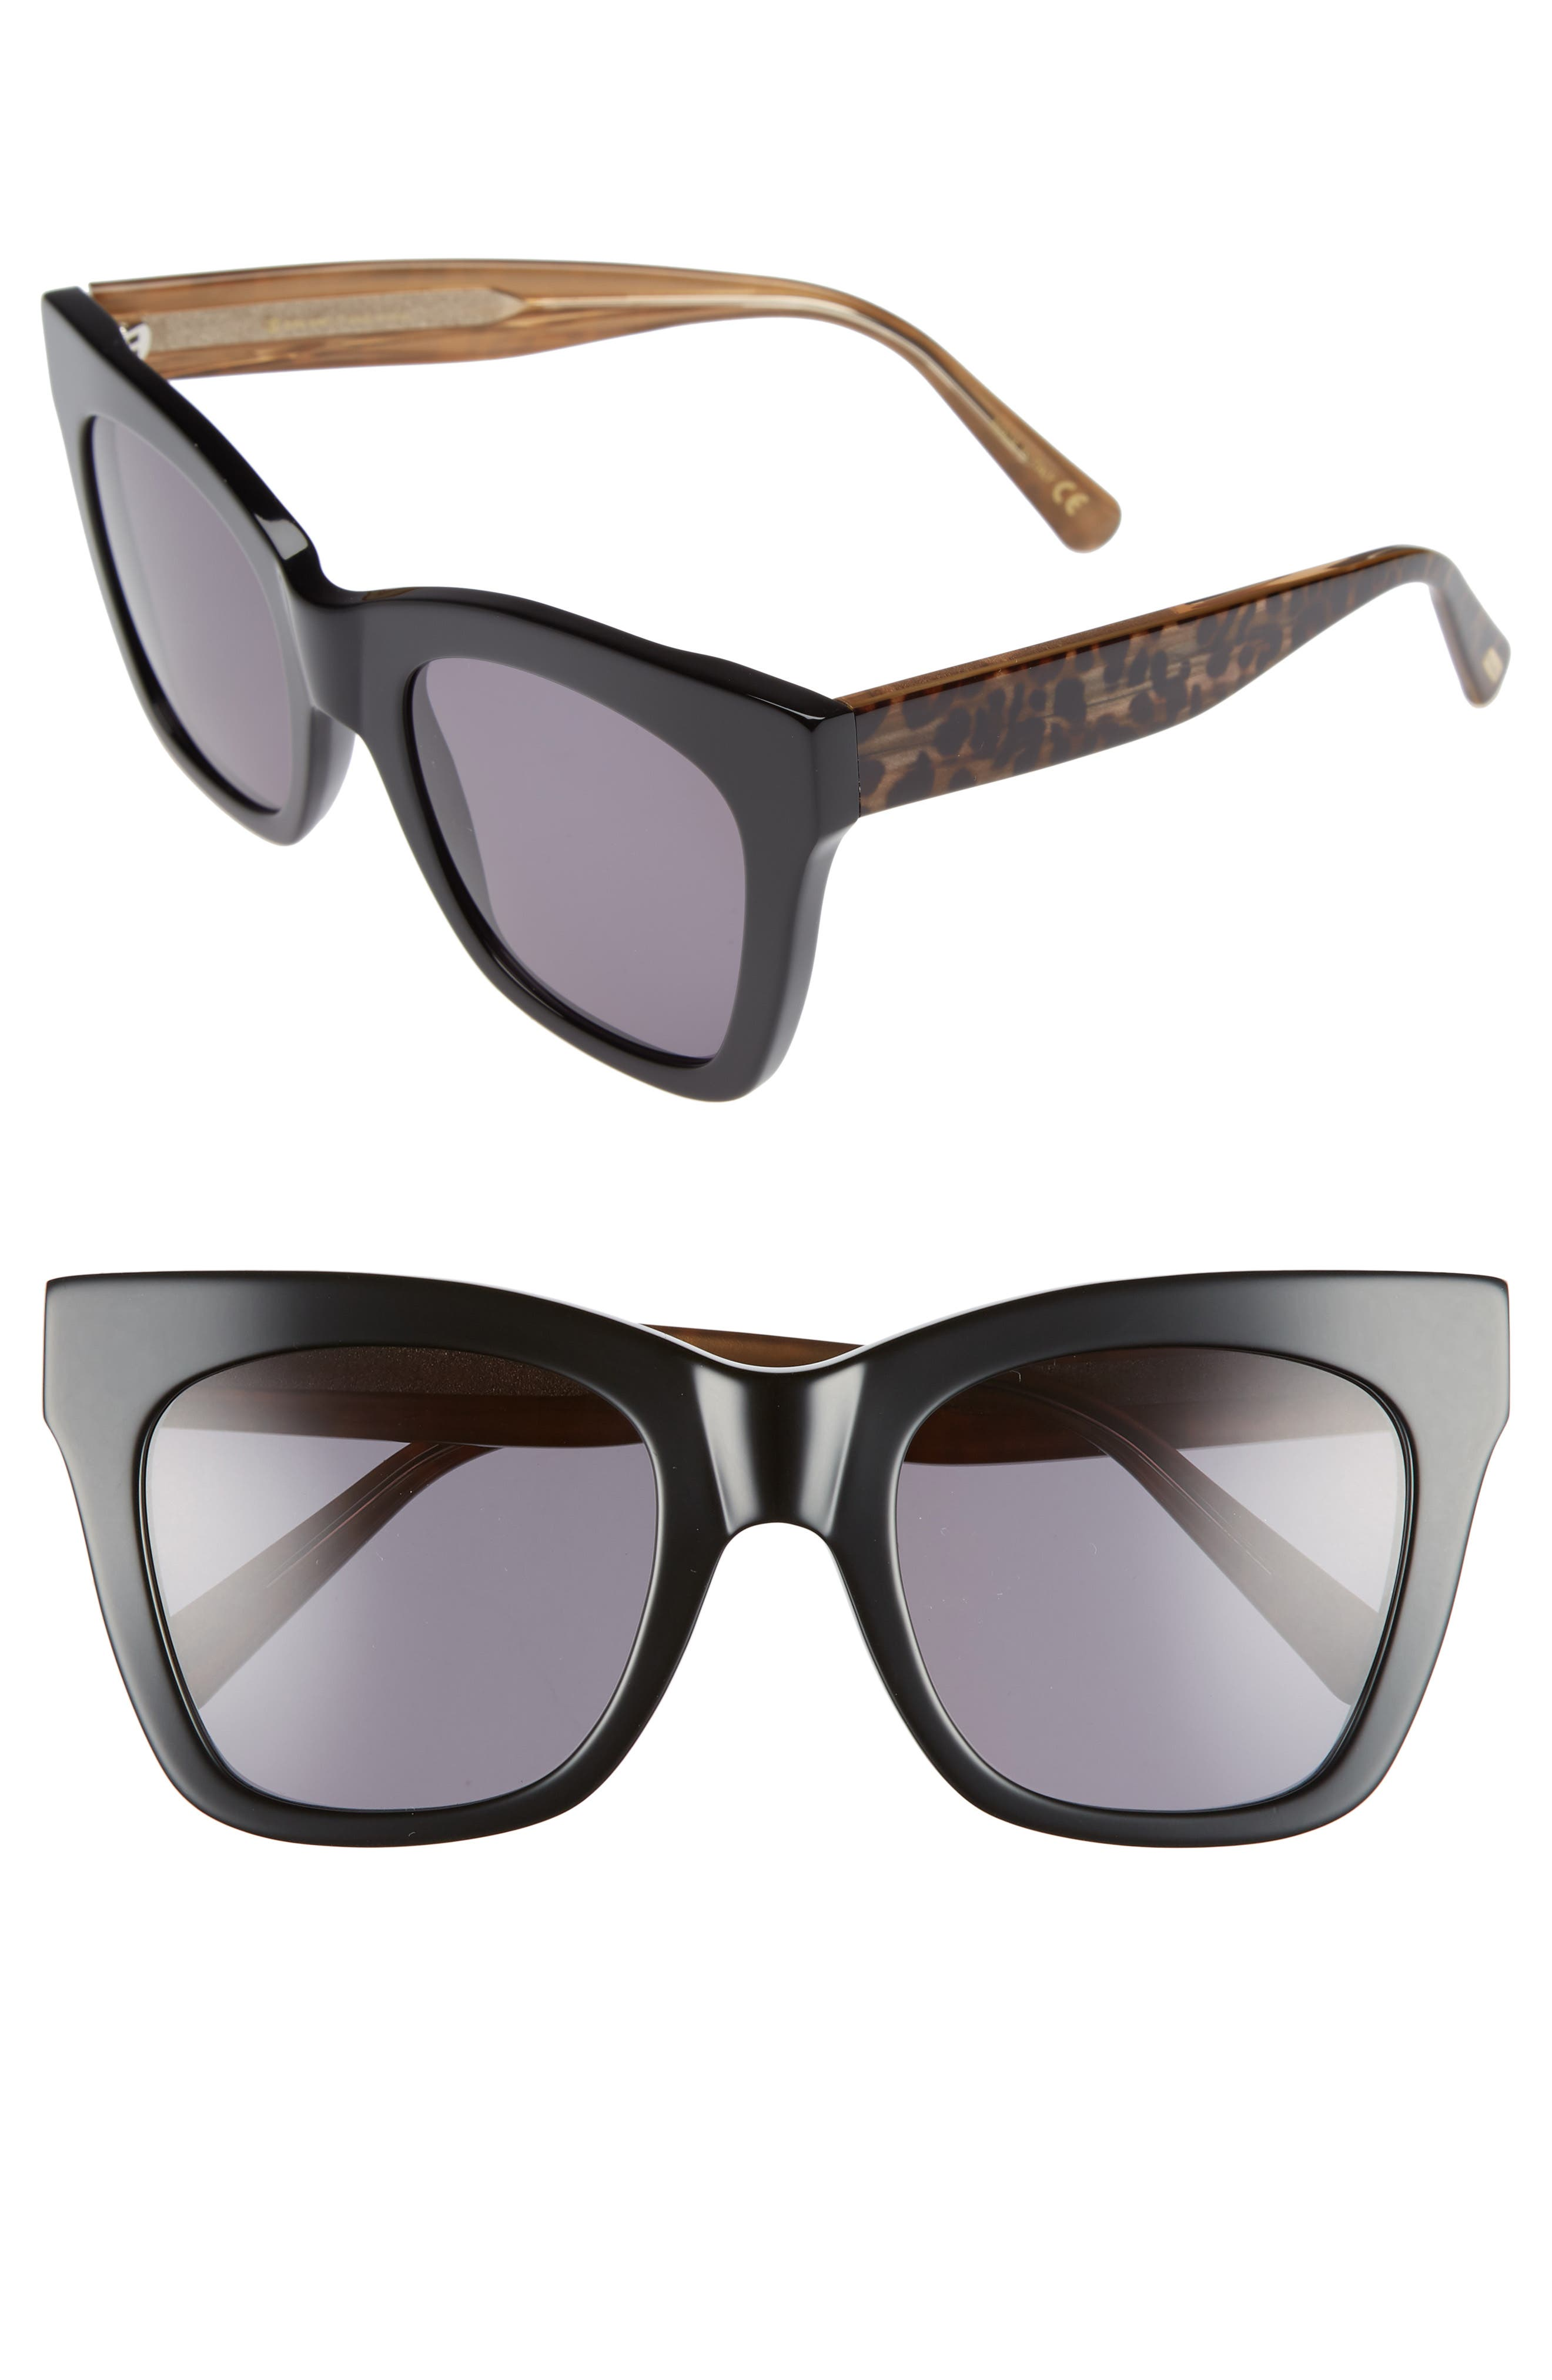 D'BLANC Beach Vida 52mm Sunglasses,                             Main thumbnail 1, color,                             BLACK CHEETAH/ GREY